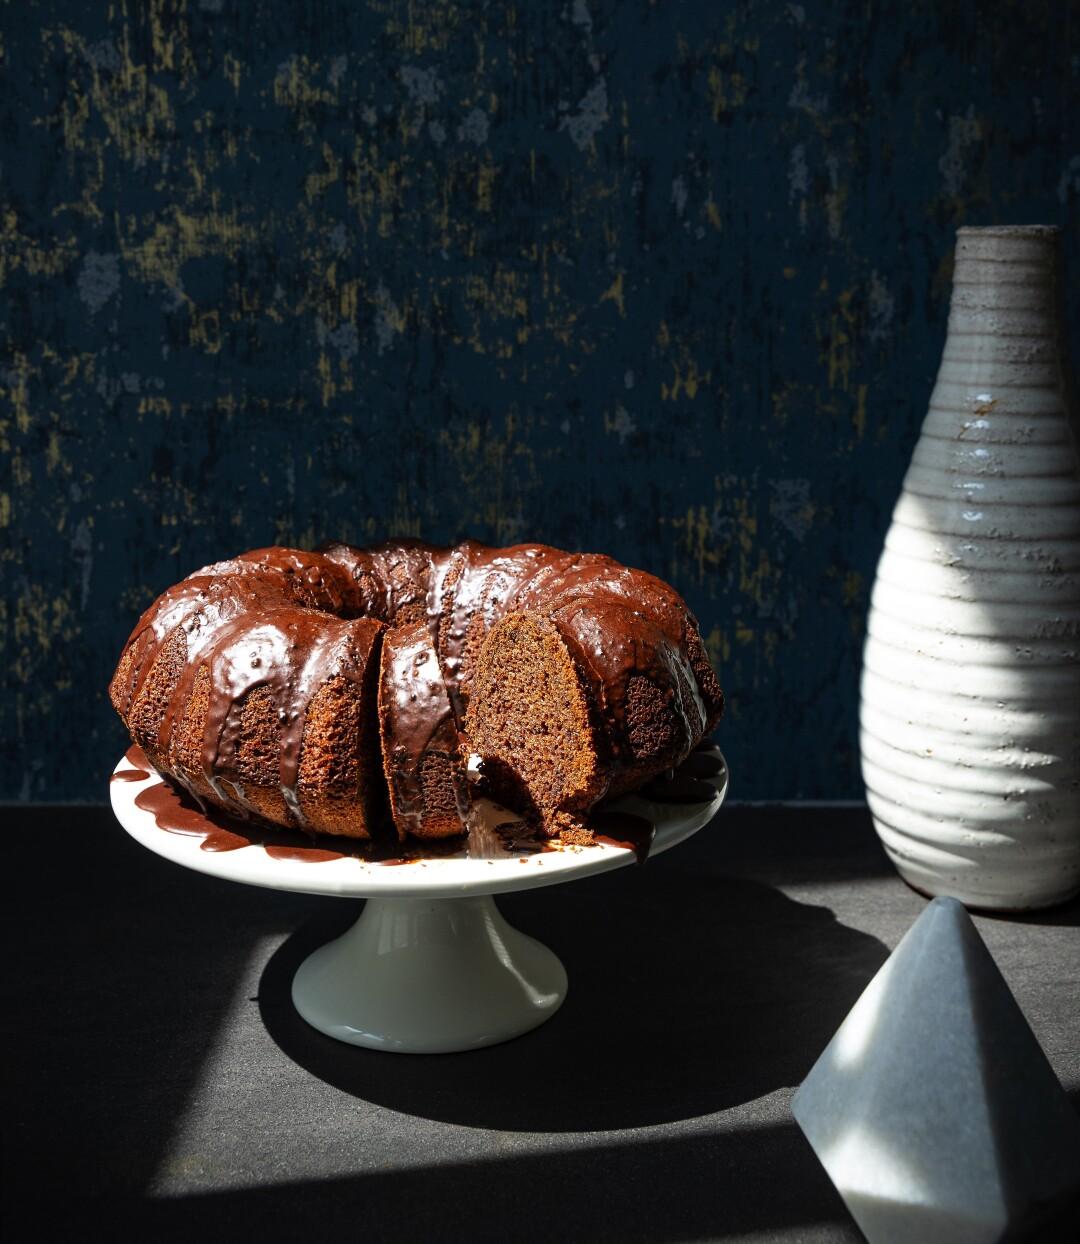 Glazed Orange Blossom and Chocolate Olive Oil Bundt Cake